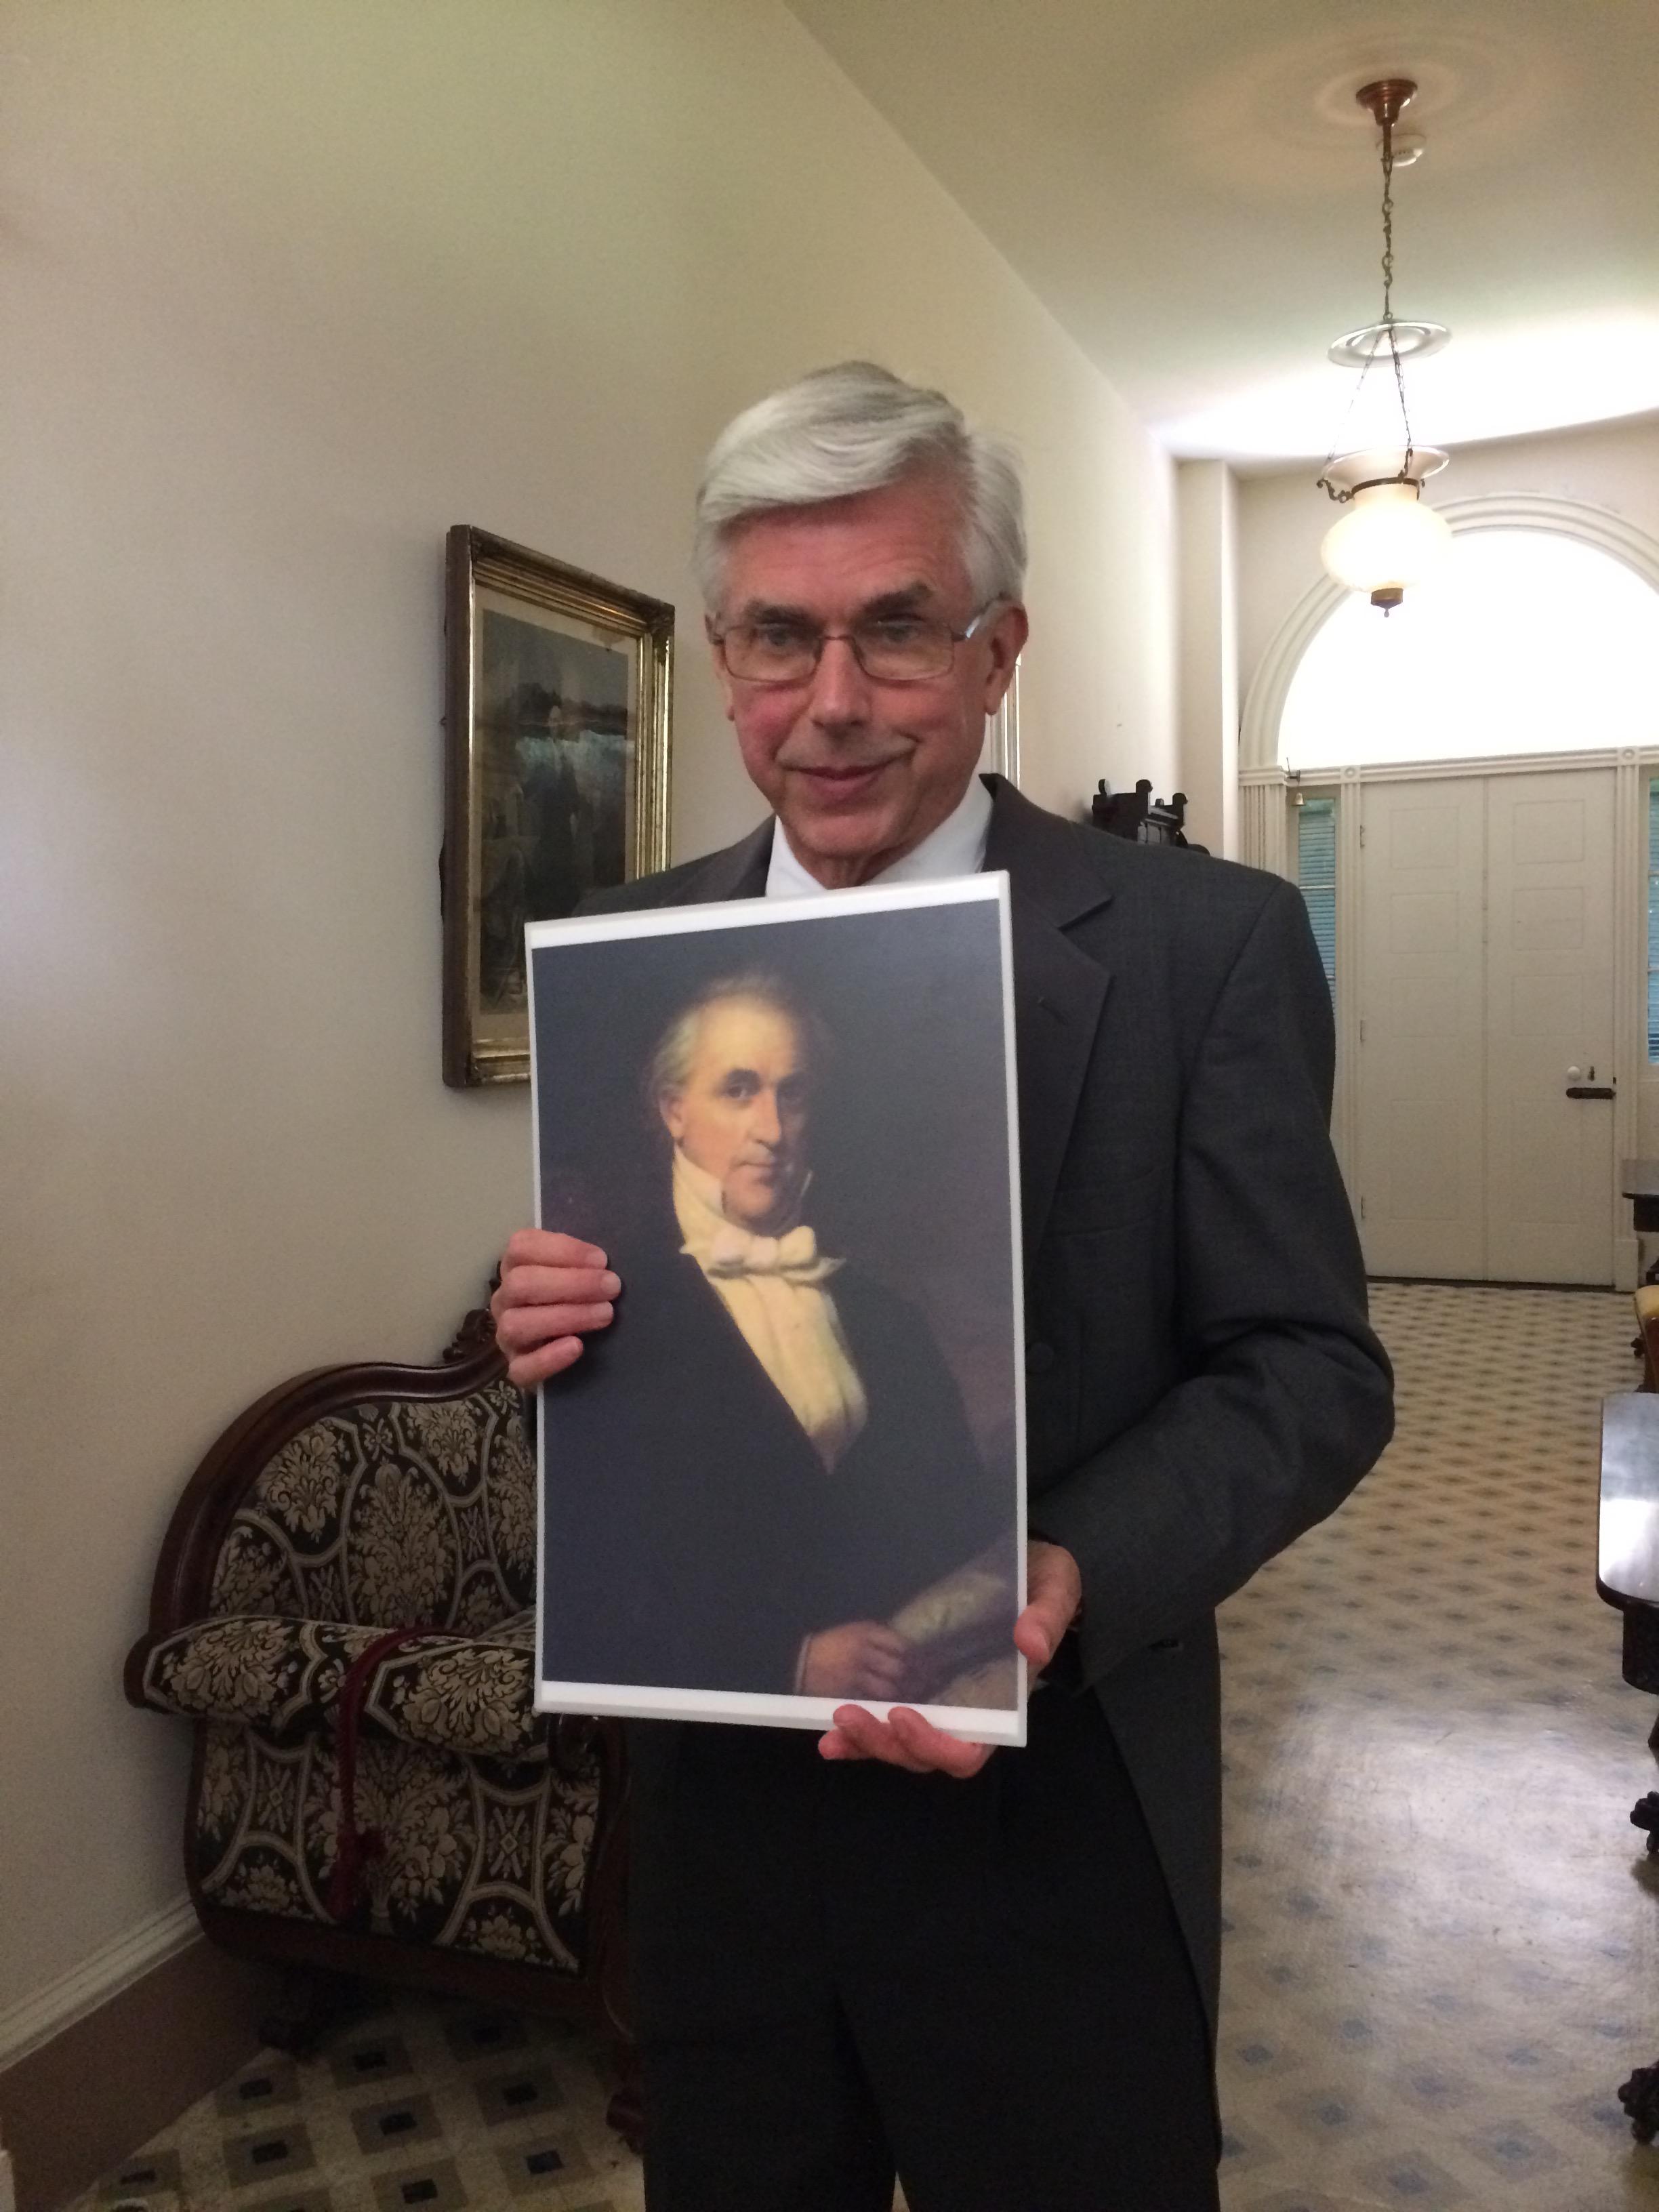 Bob Thee with a photo of President James Buchanan. Photo: Tonya Fitzpatrick